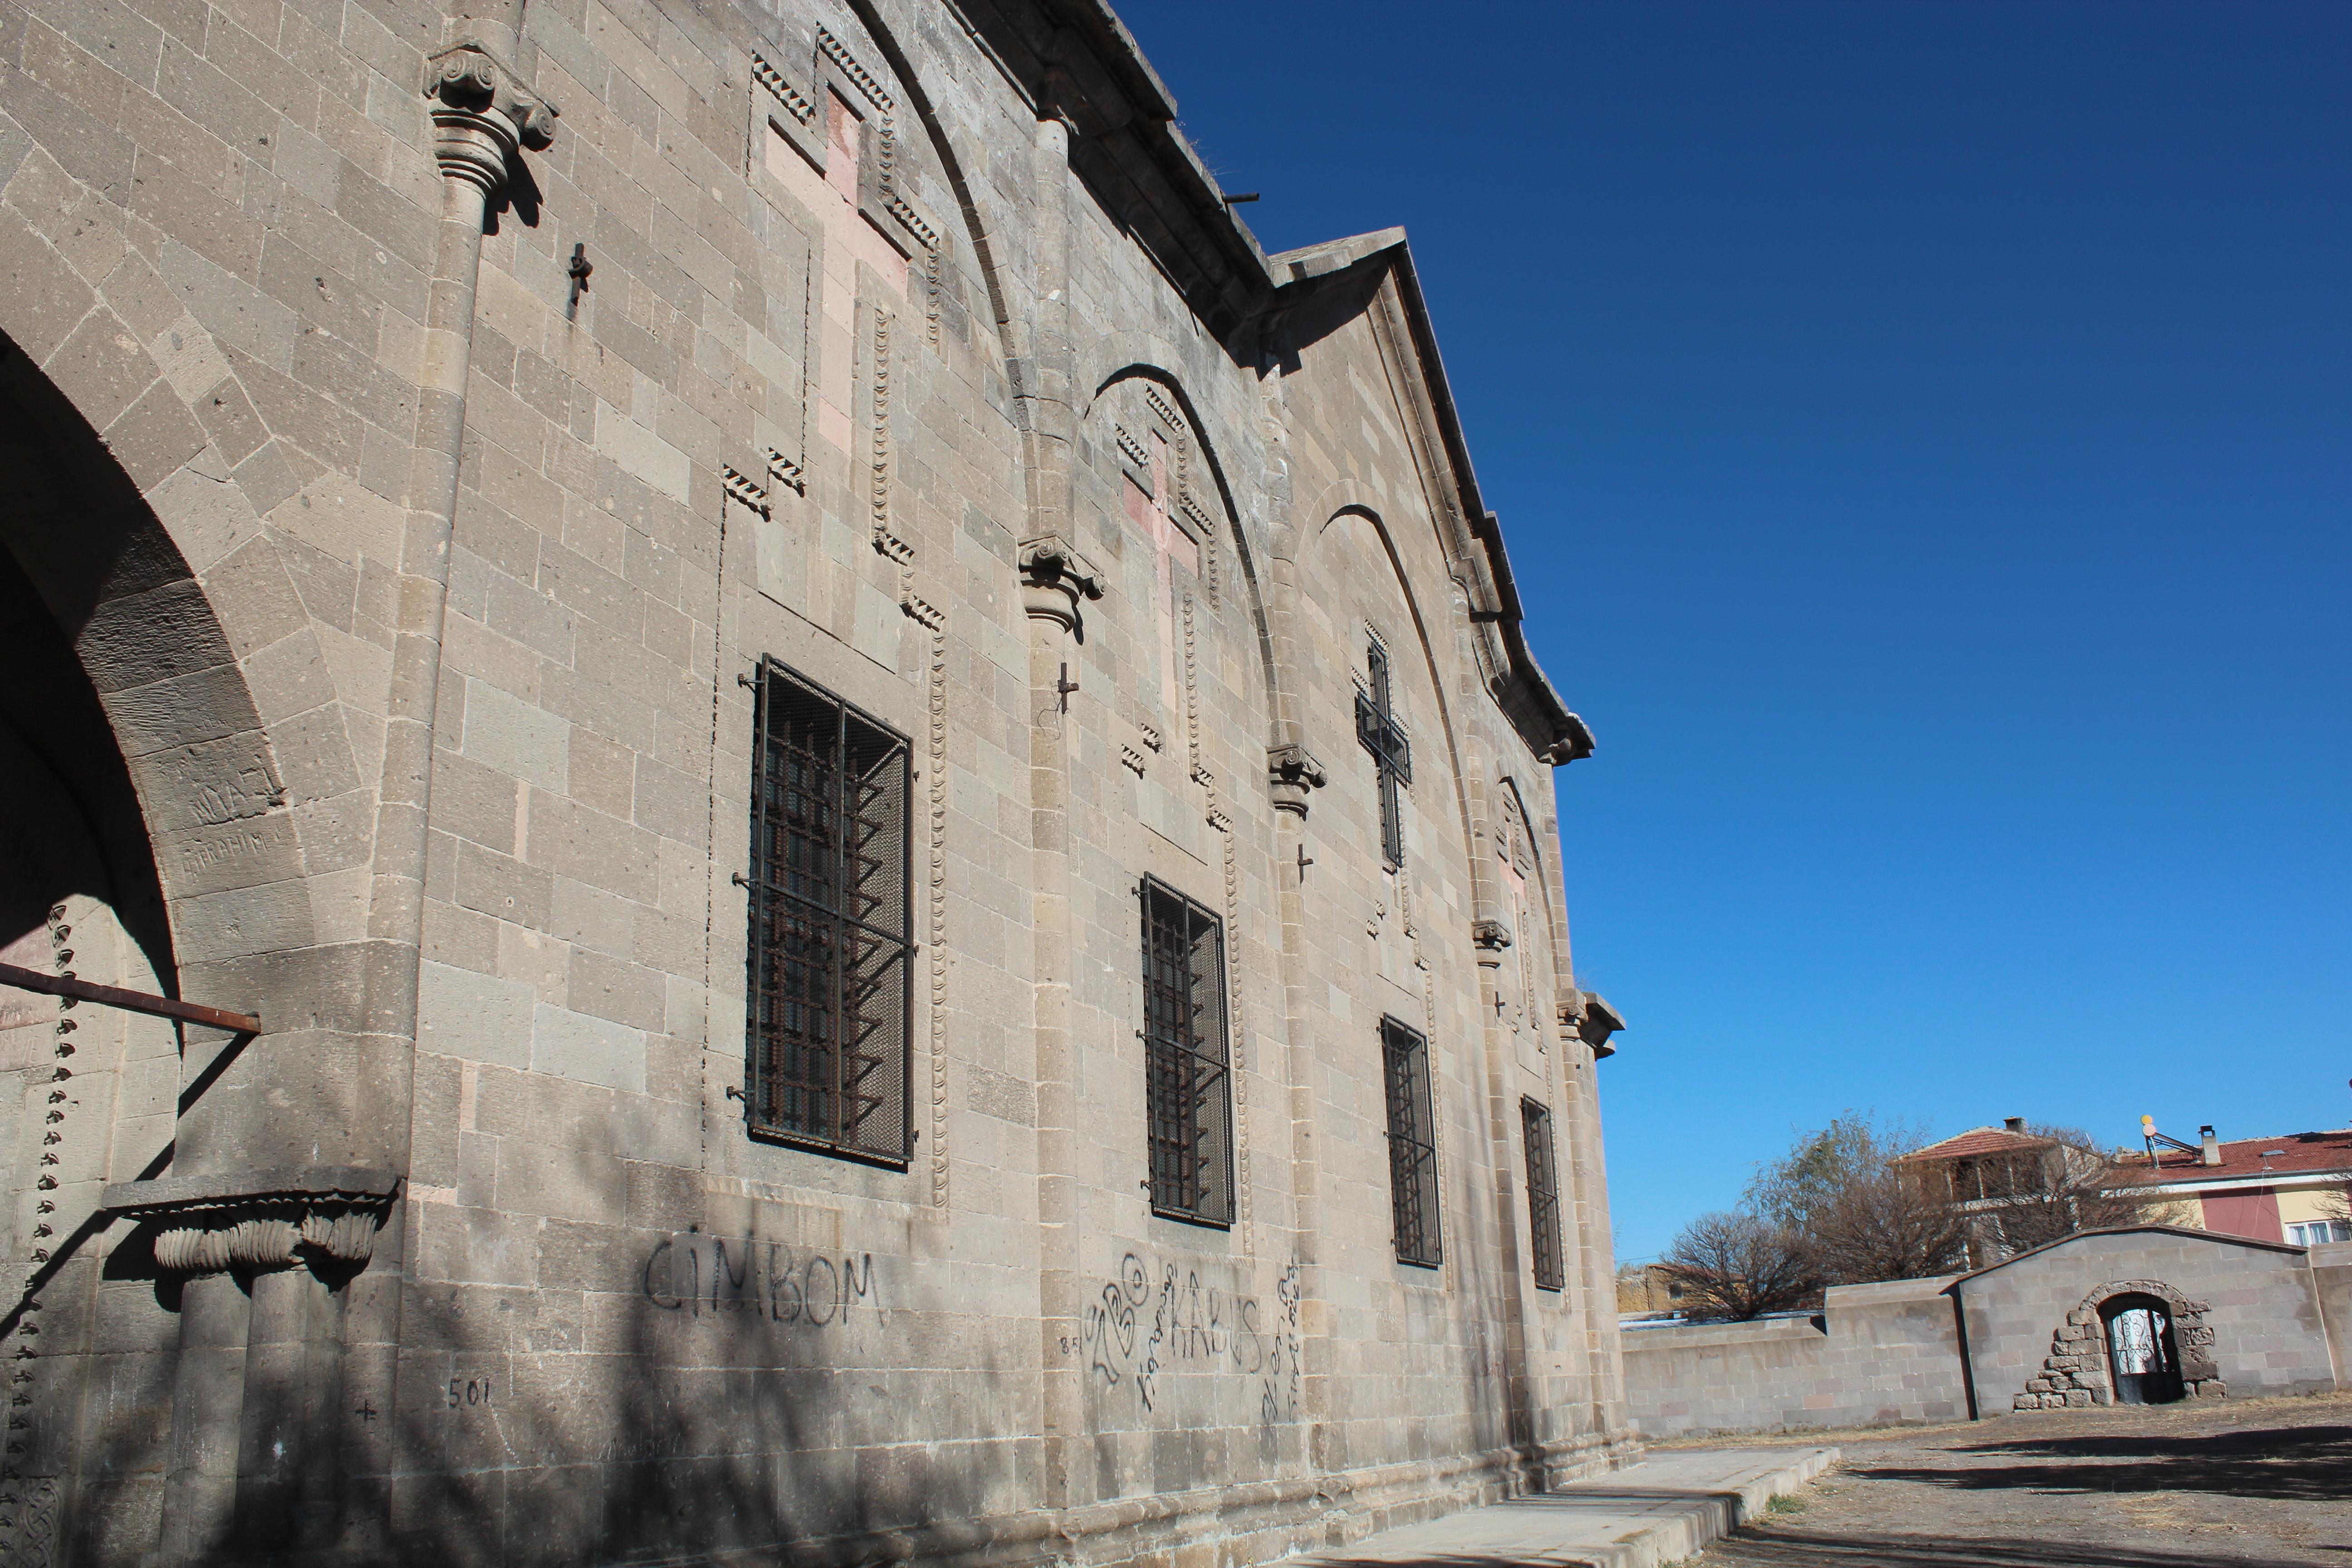 derinkuyu-kirke-underjordiskby